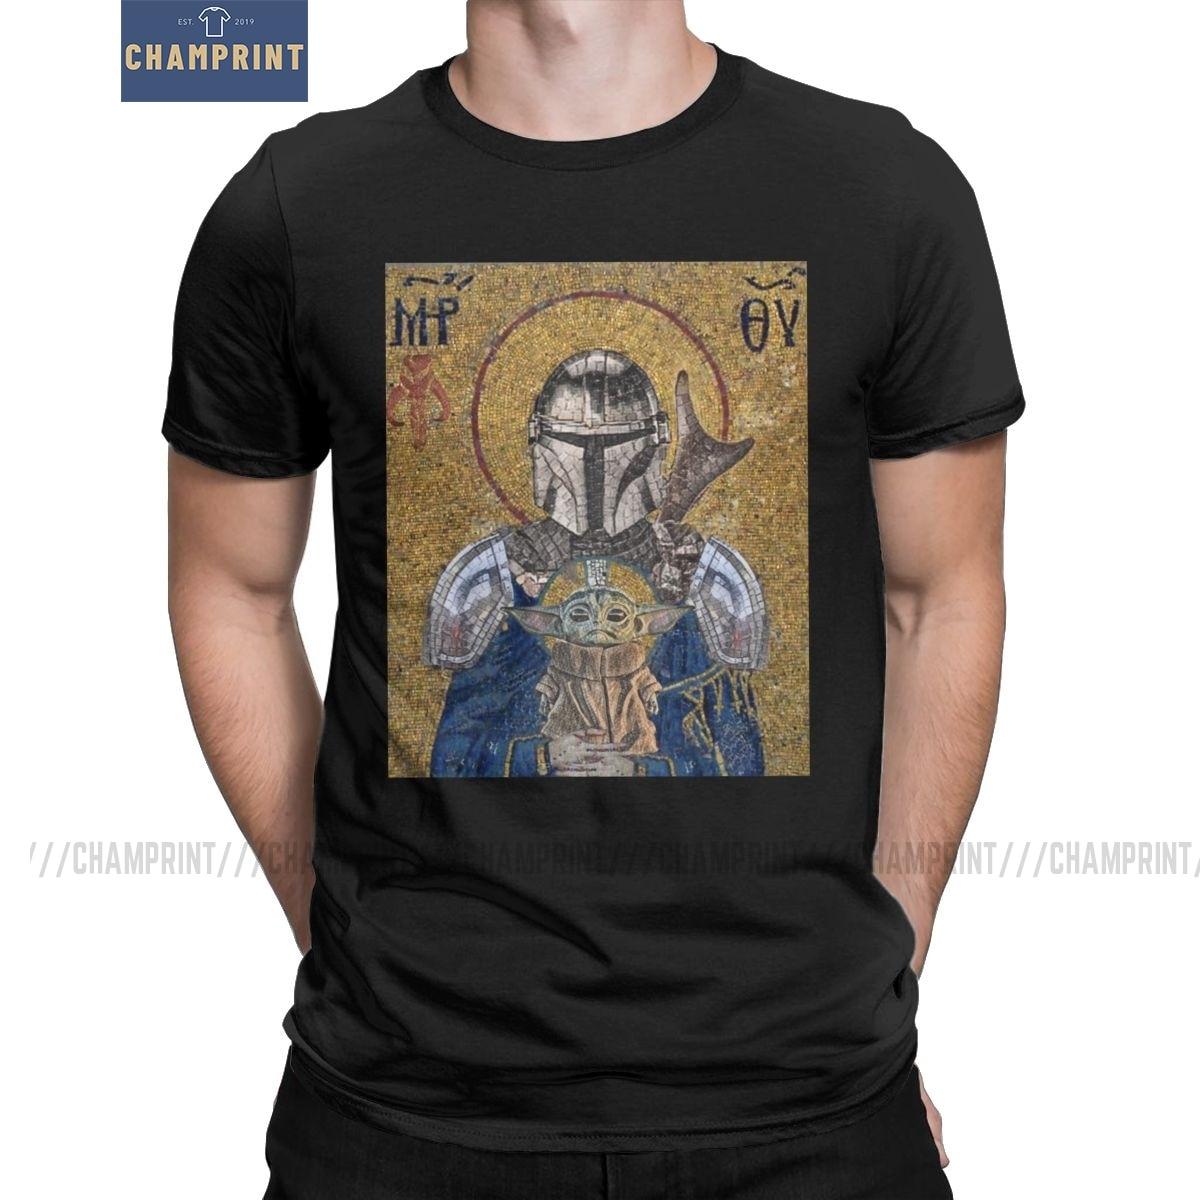 The Child Is My Religion T-Shirt Men The Mandalorian Baby Yoda T Shirt Star Wars Jedi Fett Cotton Tee Short Sleeve Plus Size Top